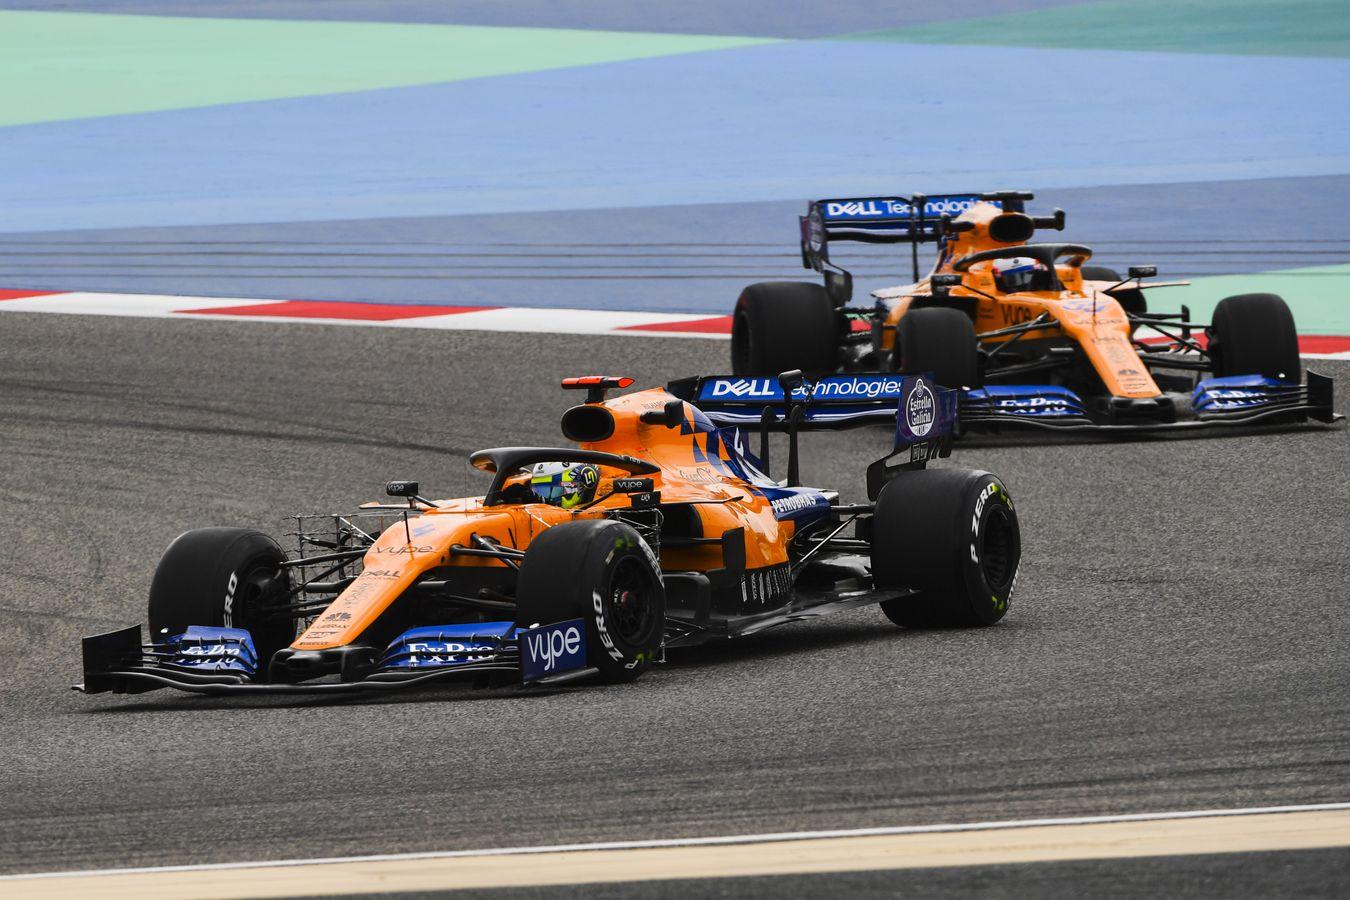 Mclaren Formula 1: Bahrain In-season Test: Day 2